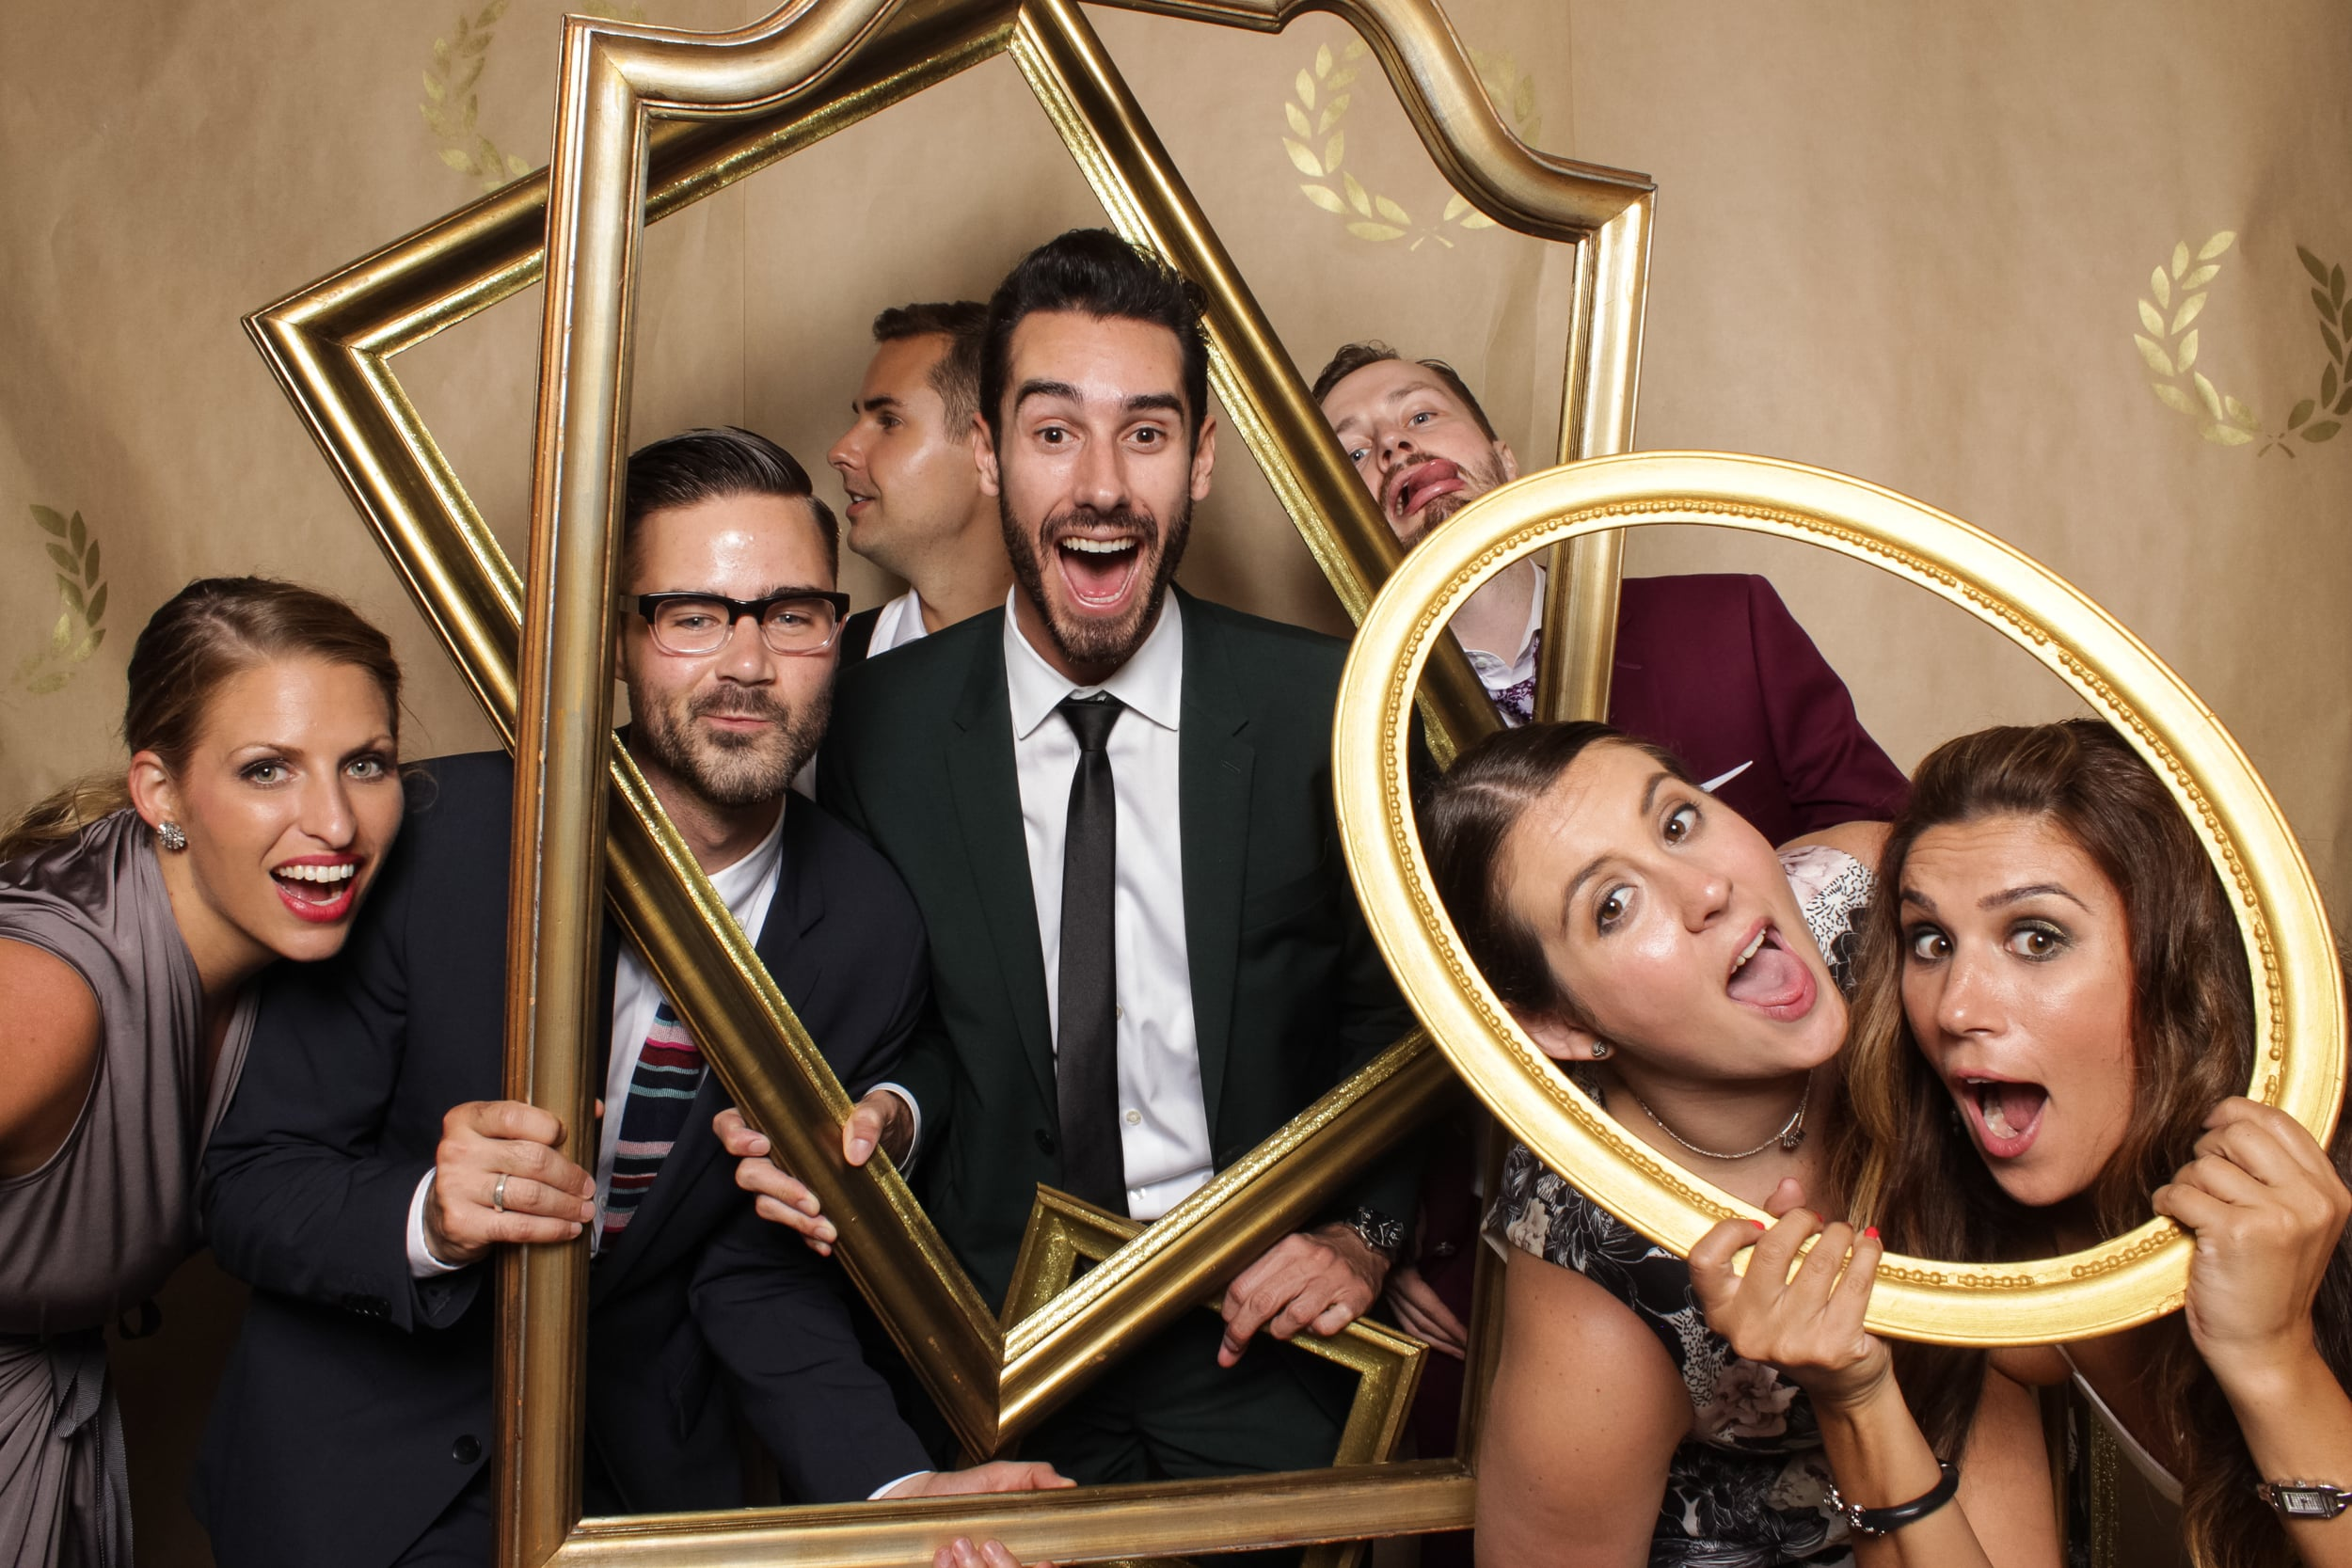 ottawa-wedding-photobooth-51.JPG